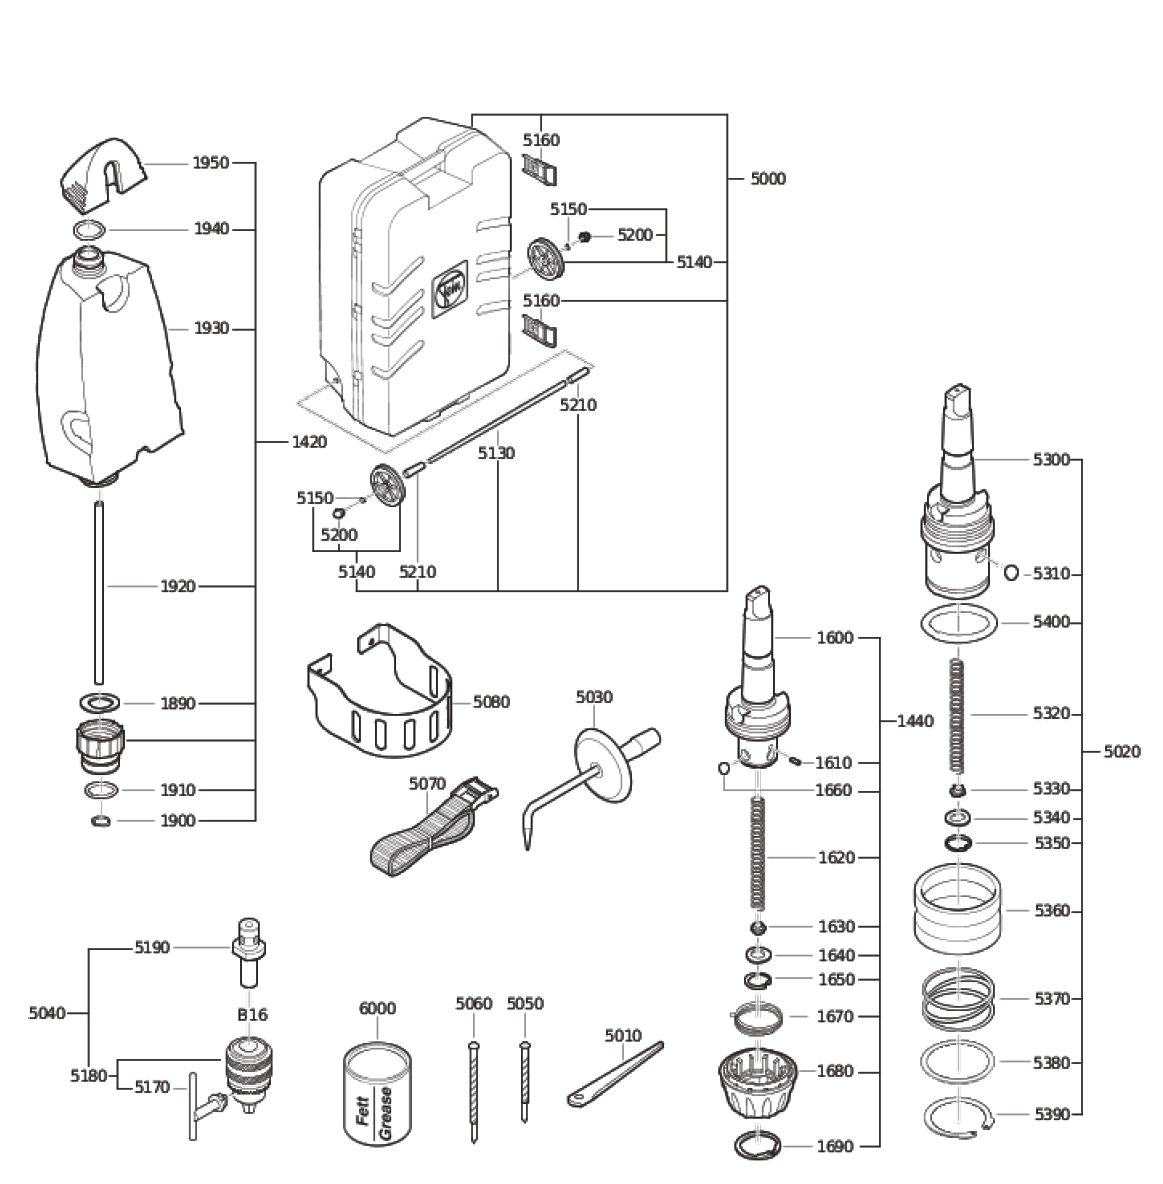 Fein-72703209360-Parts-4013-PBBreak Down